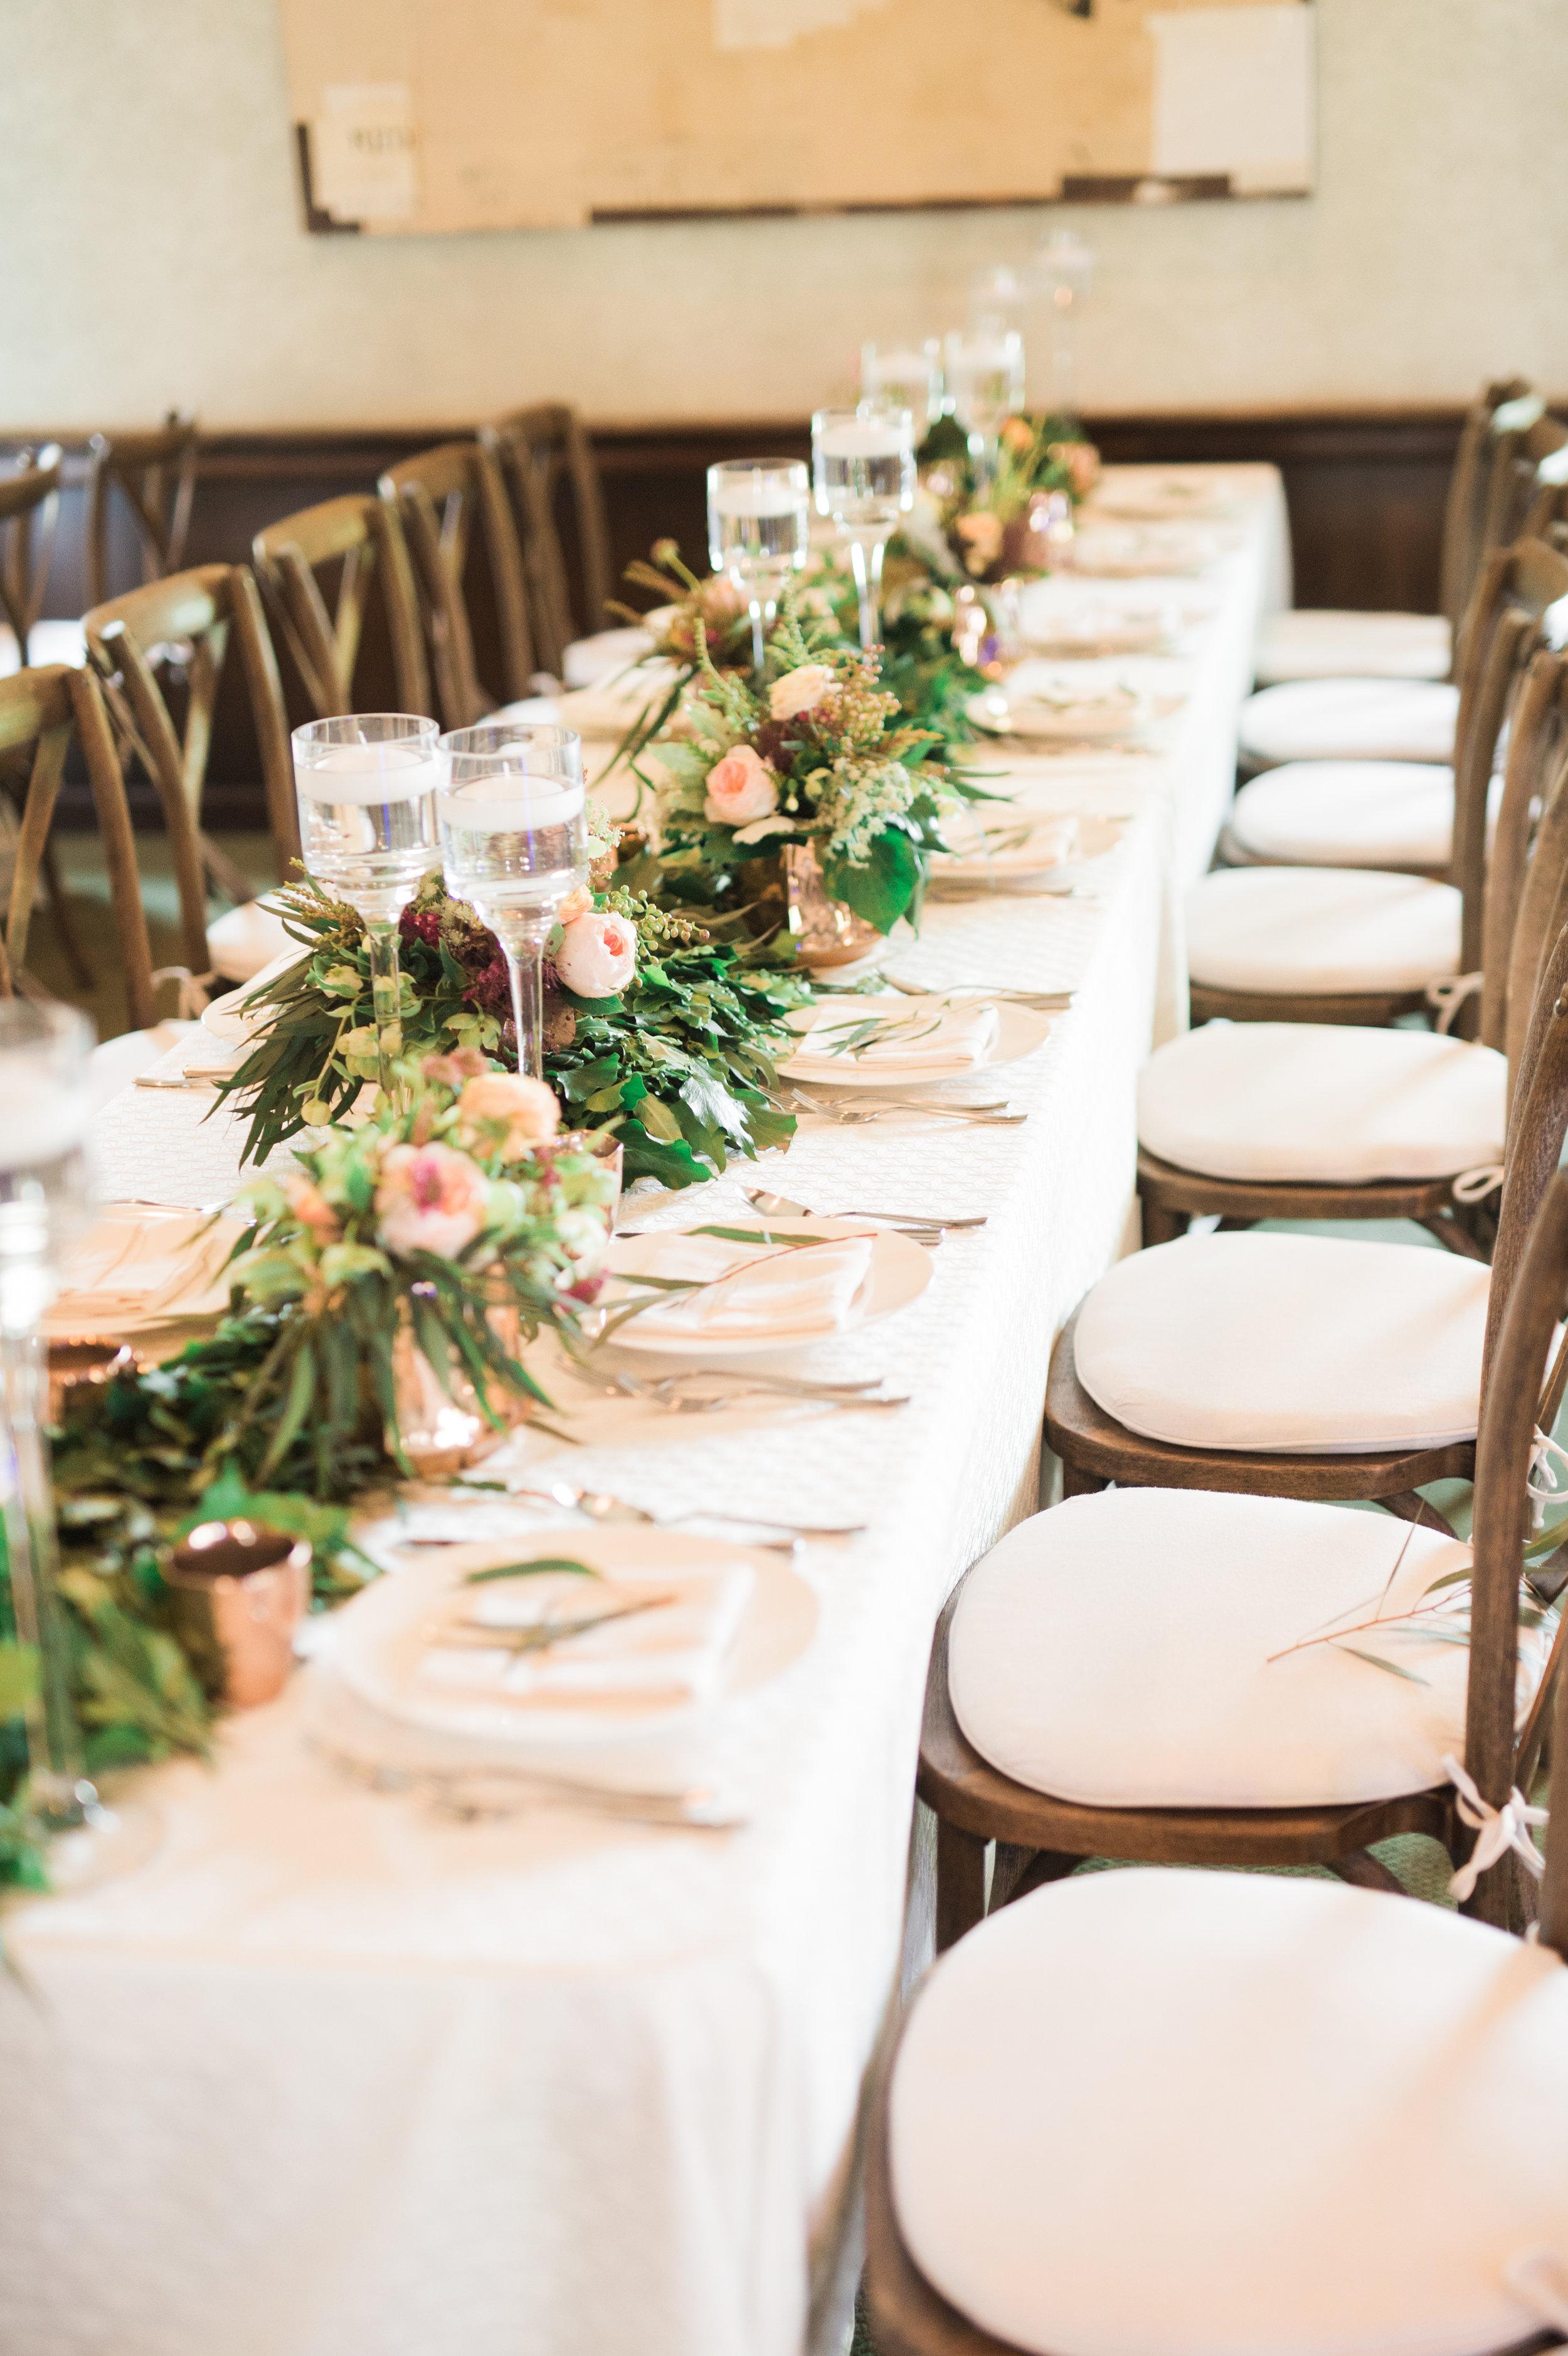 Amarillo Tx floral design and wedding coordination by Parie Designs